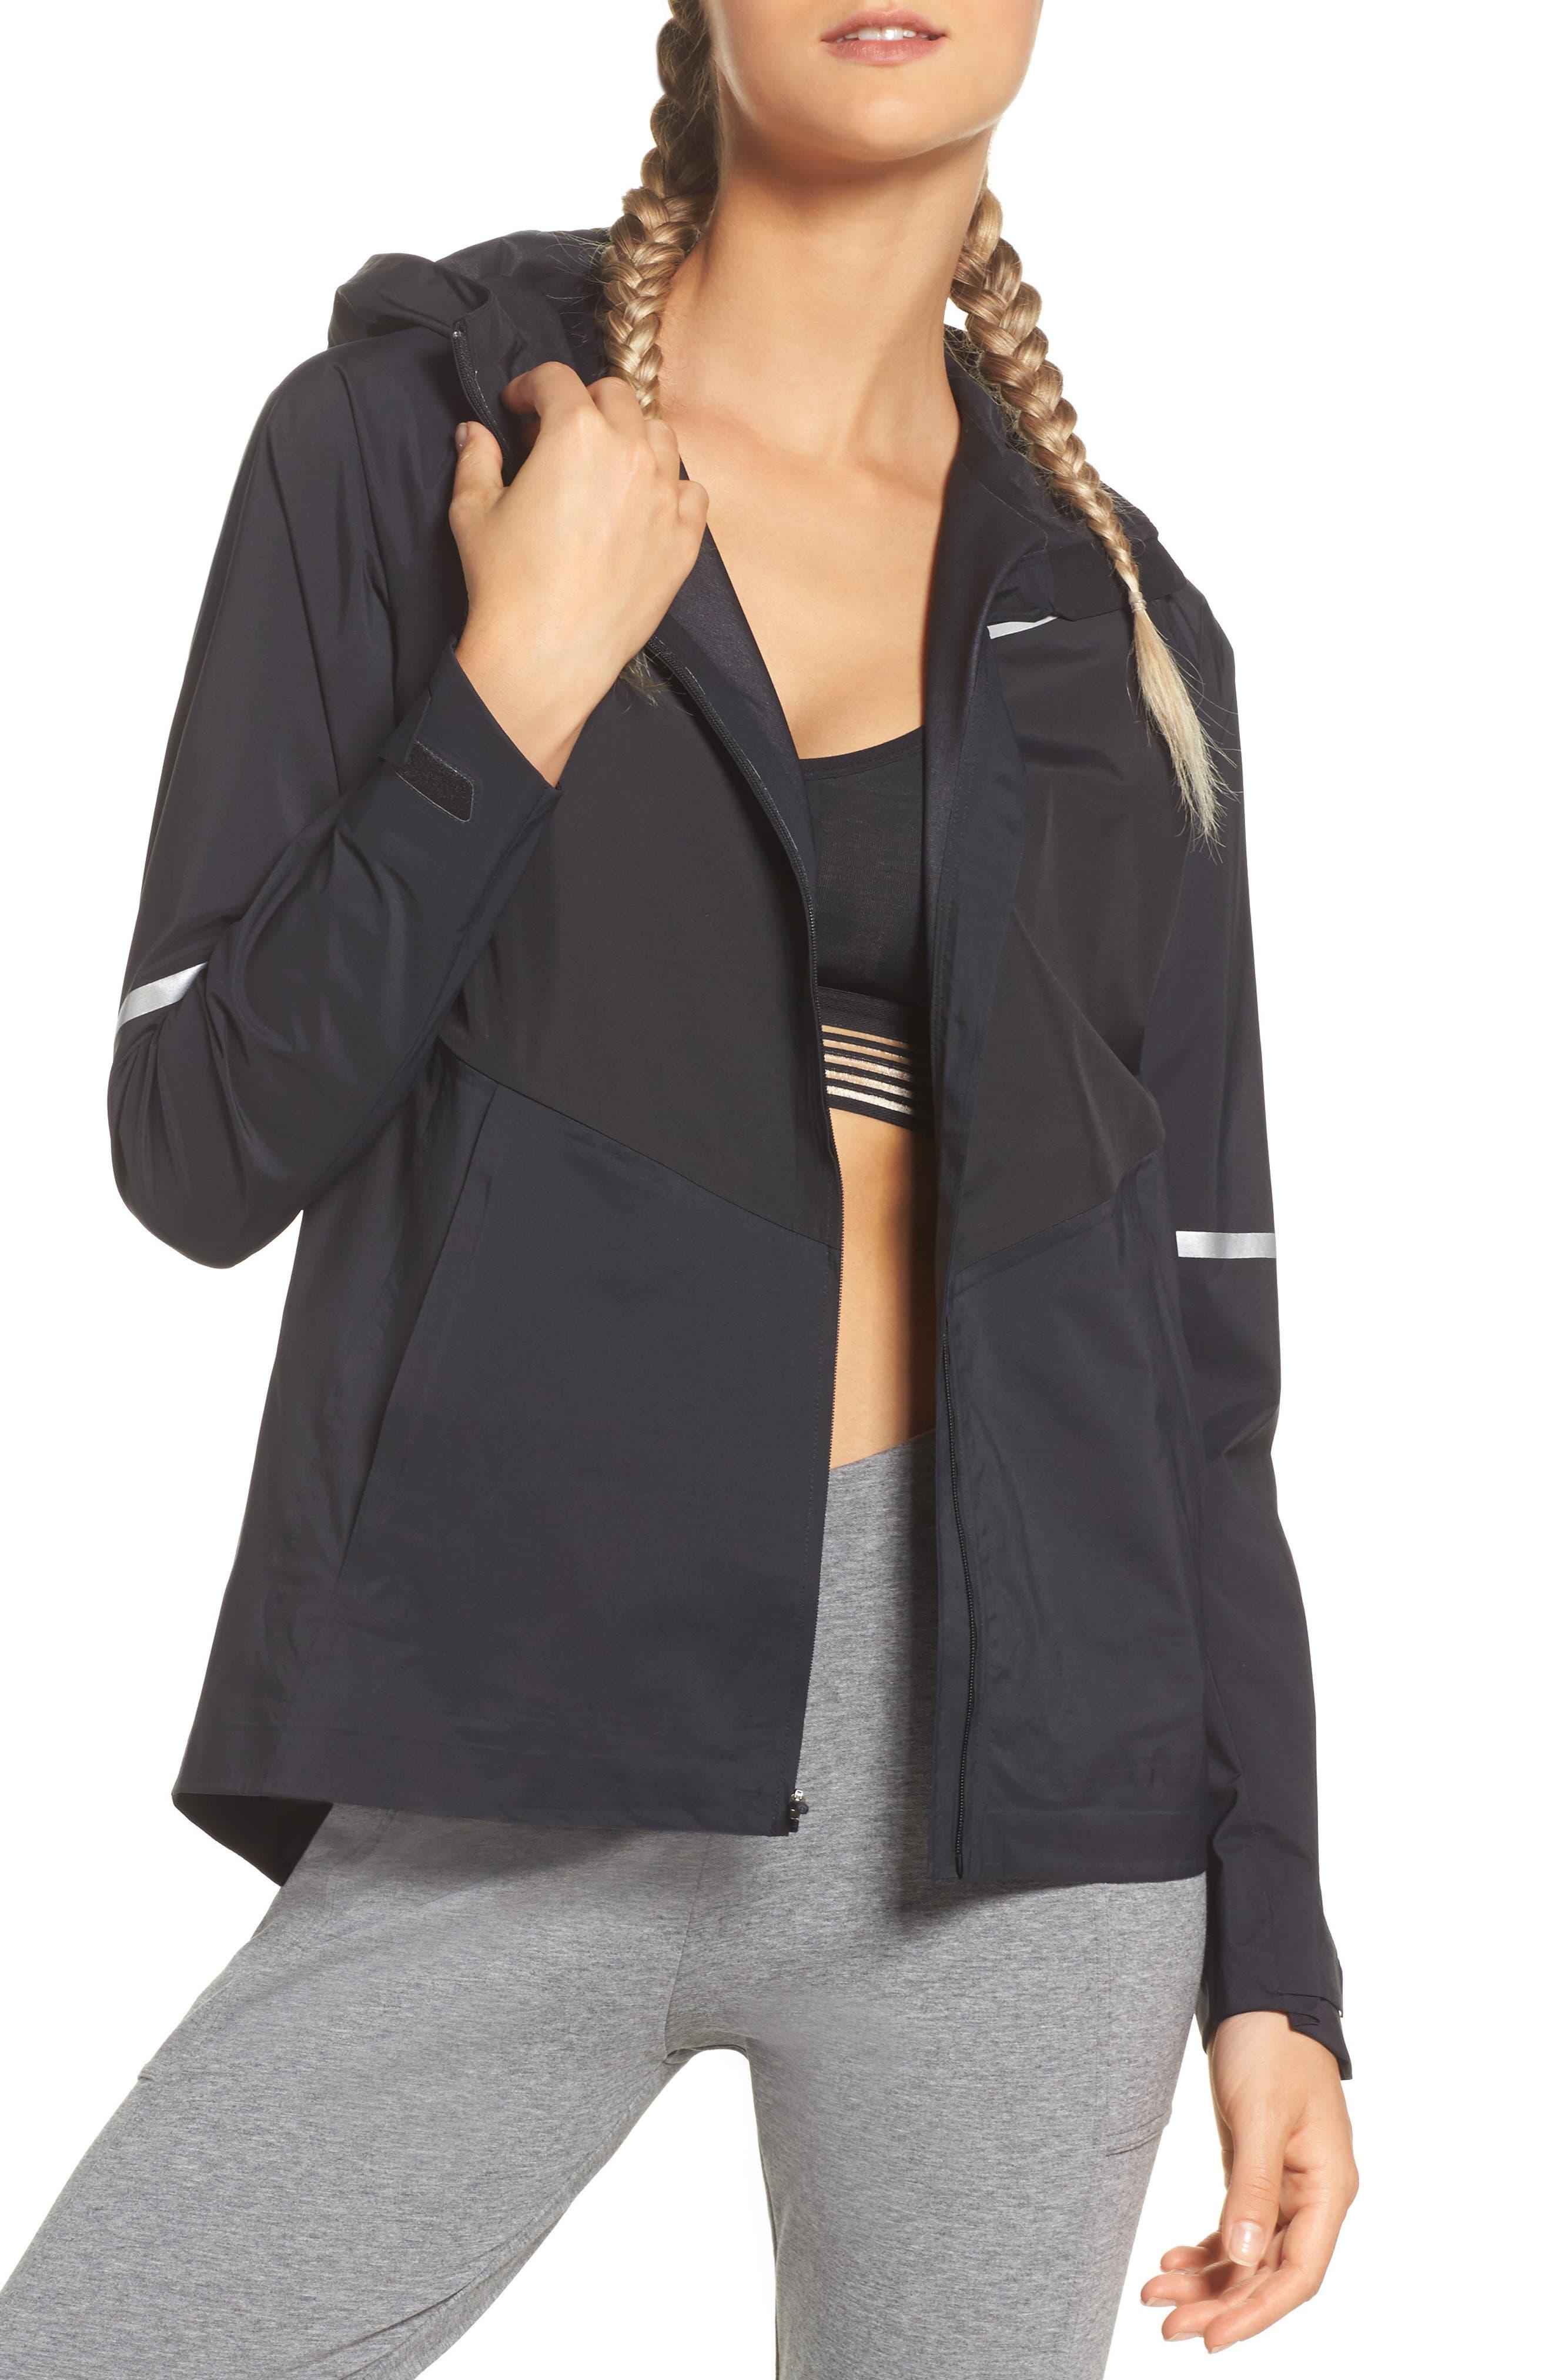 Zonal AeroShield Hooded Running Jacket,                         Main,                         color, 010